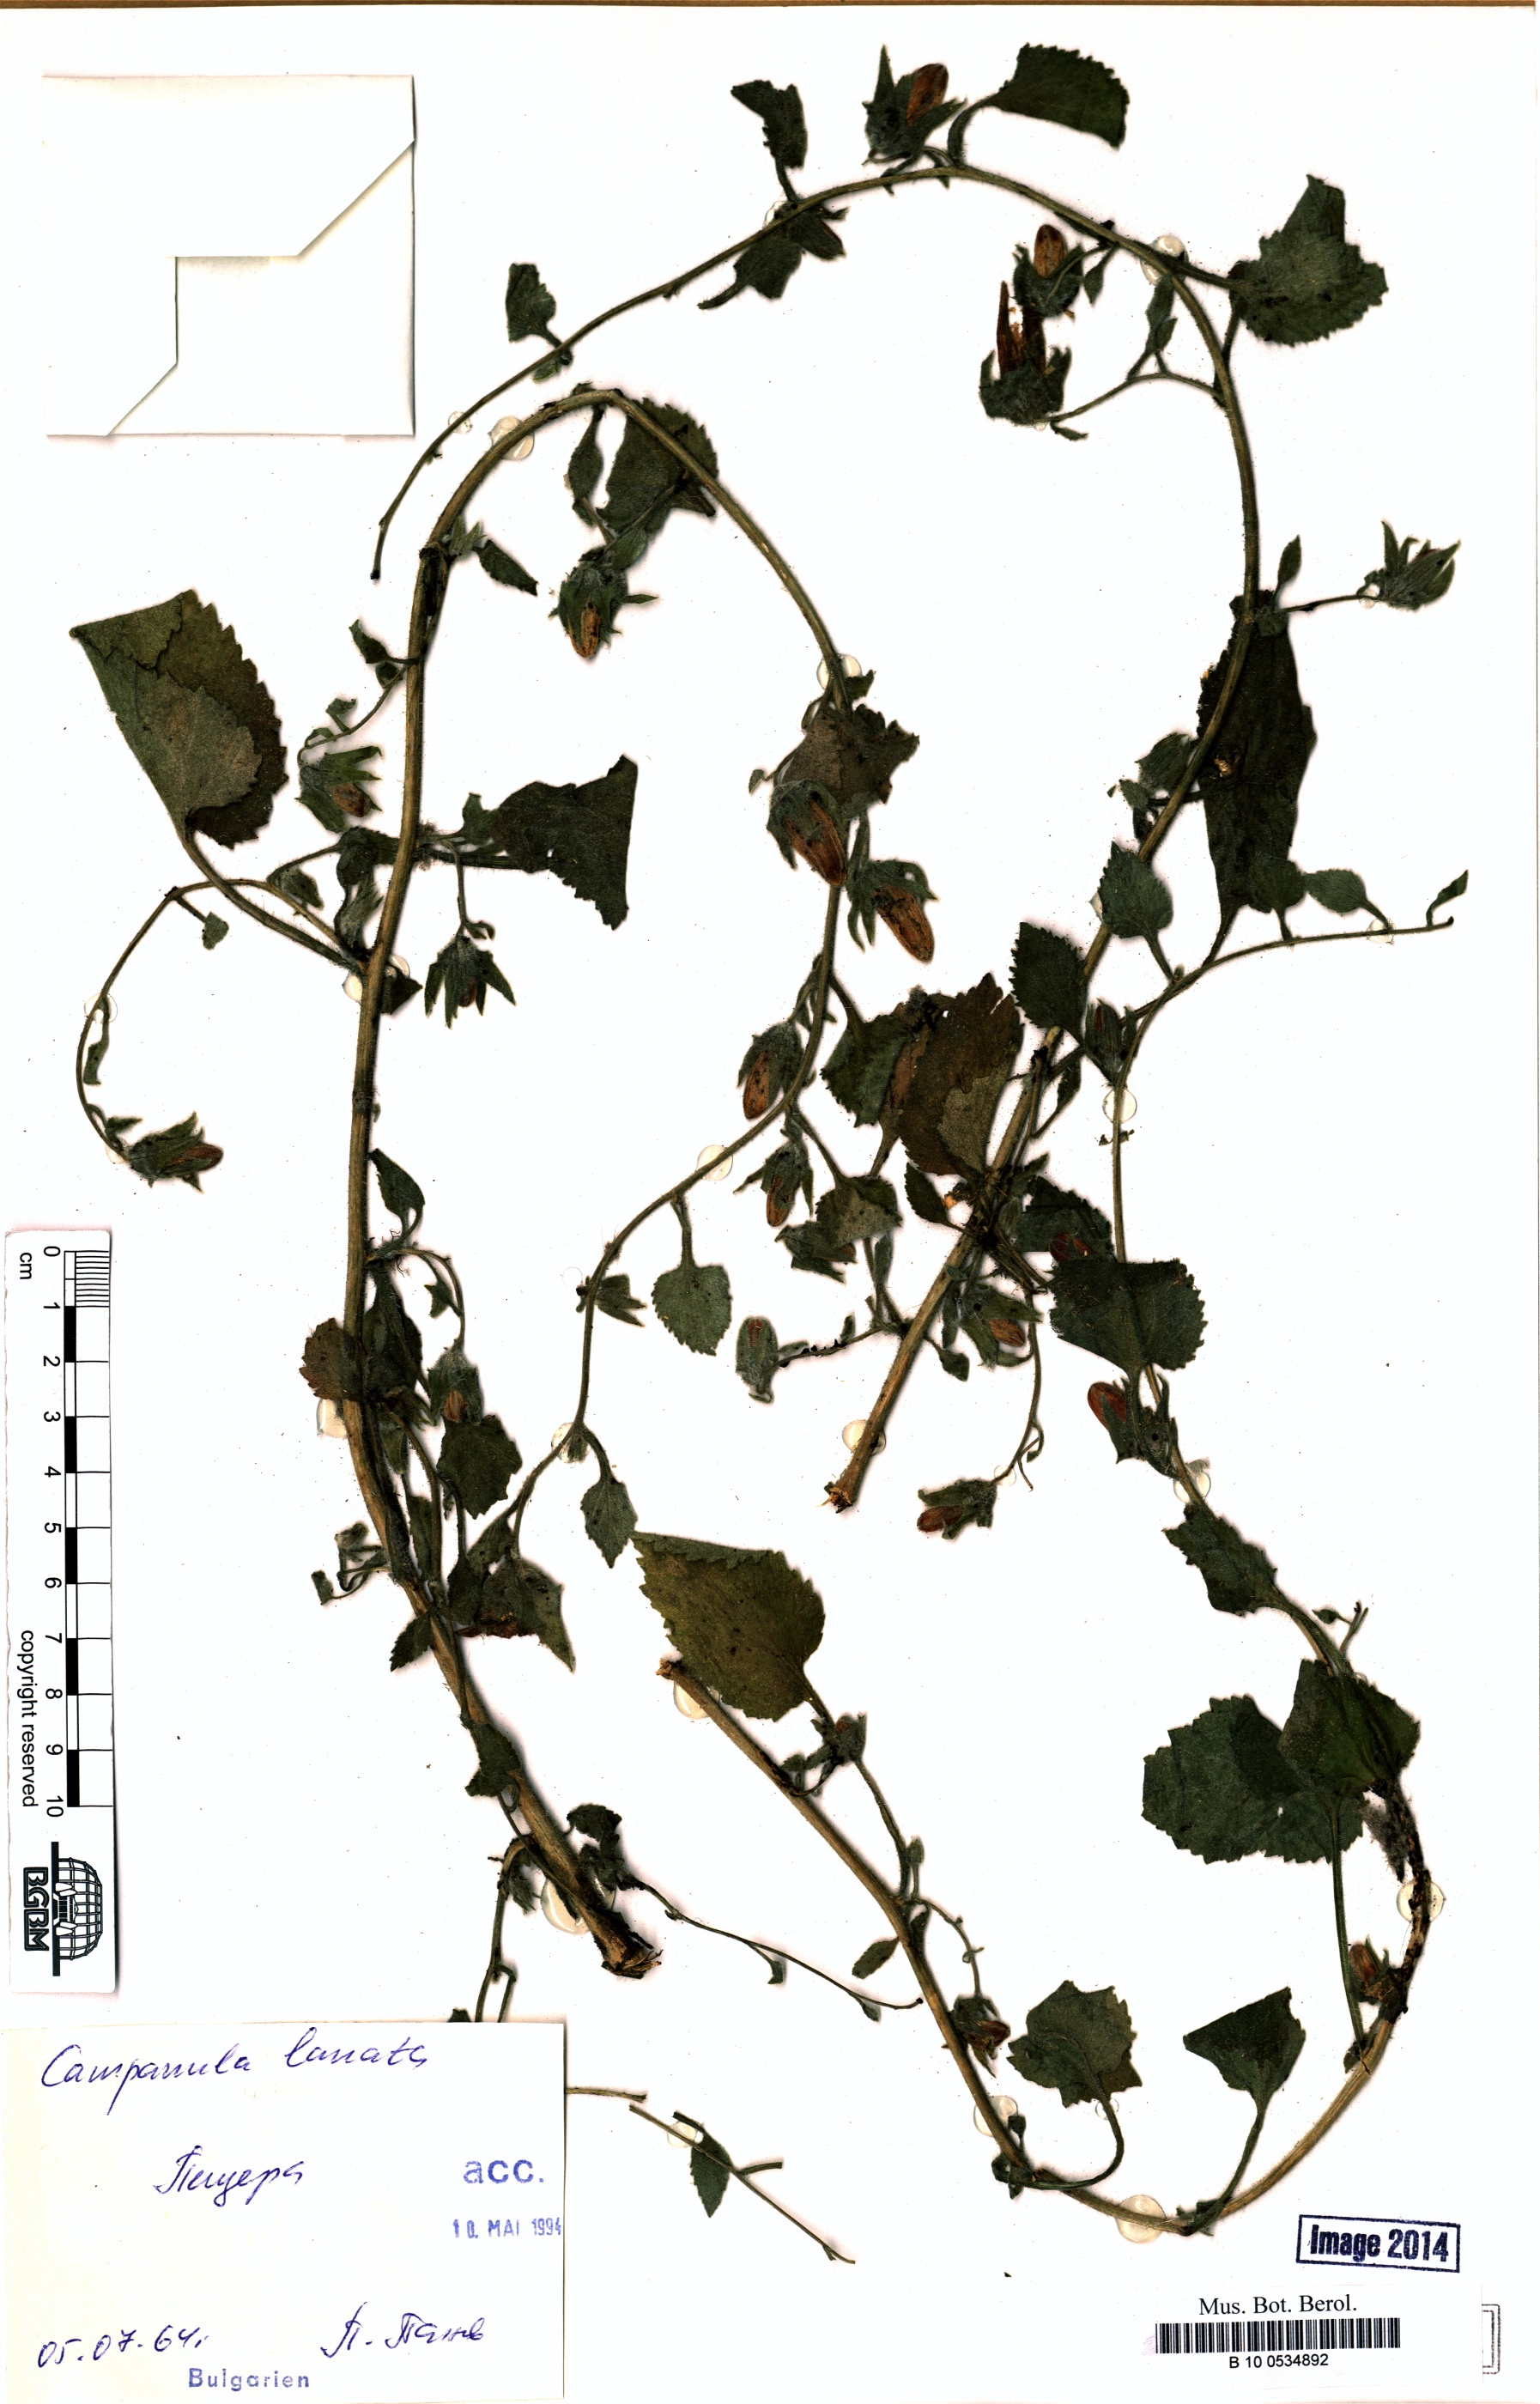 http://ww2.bgbm.org/herbarium/images/B/10/05/34/89/B_10_0534892.jpg